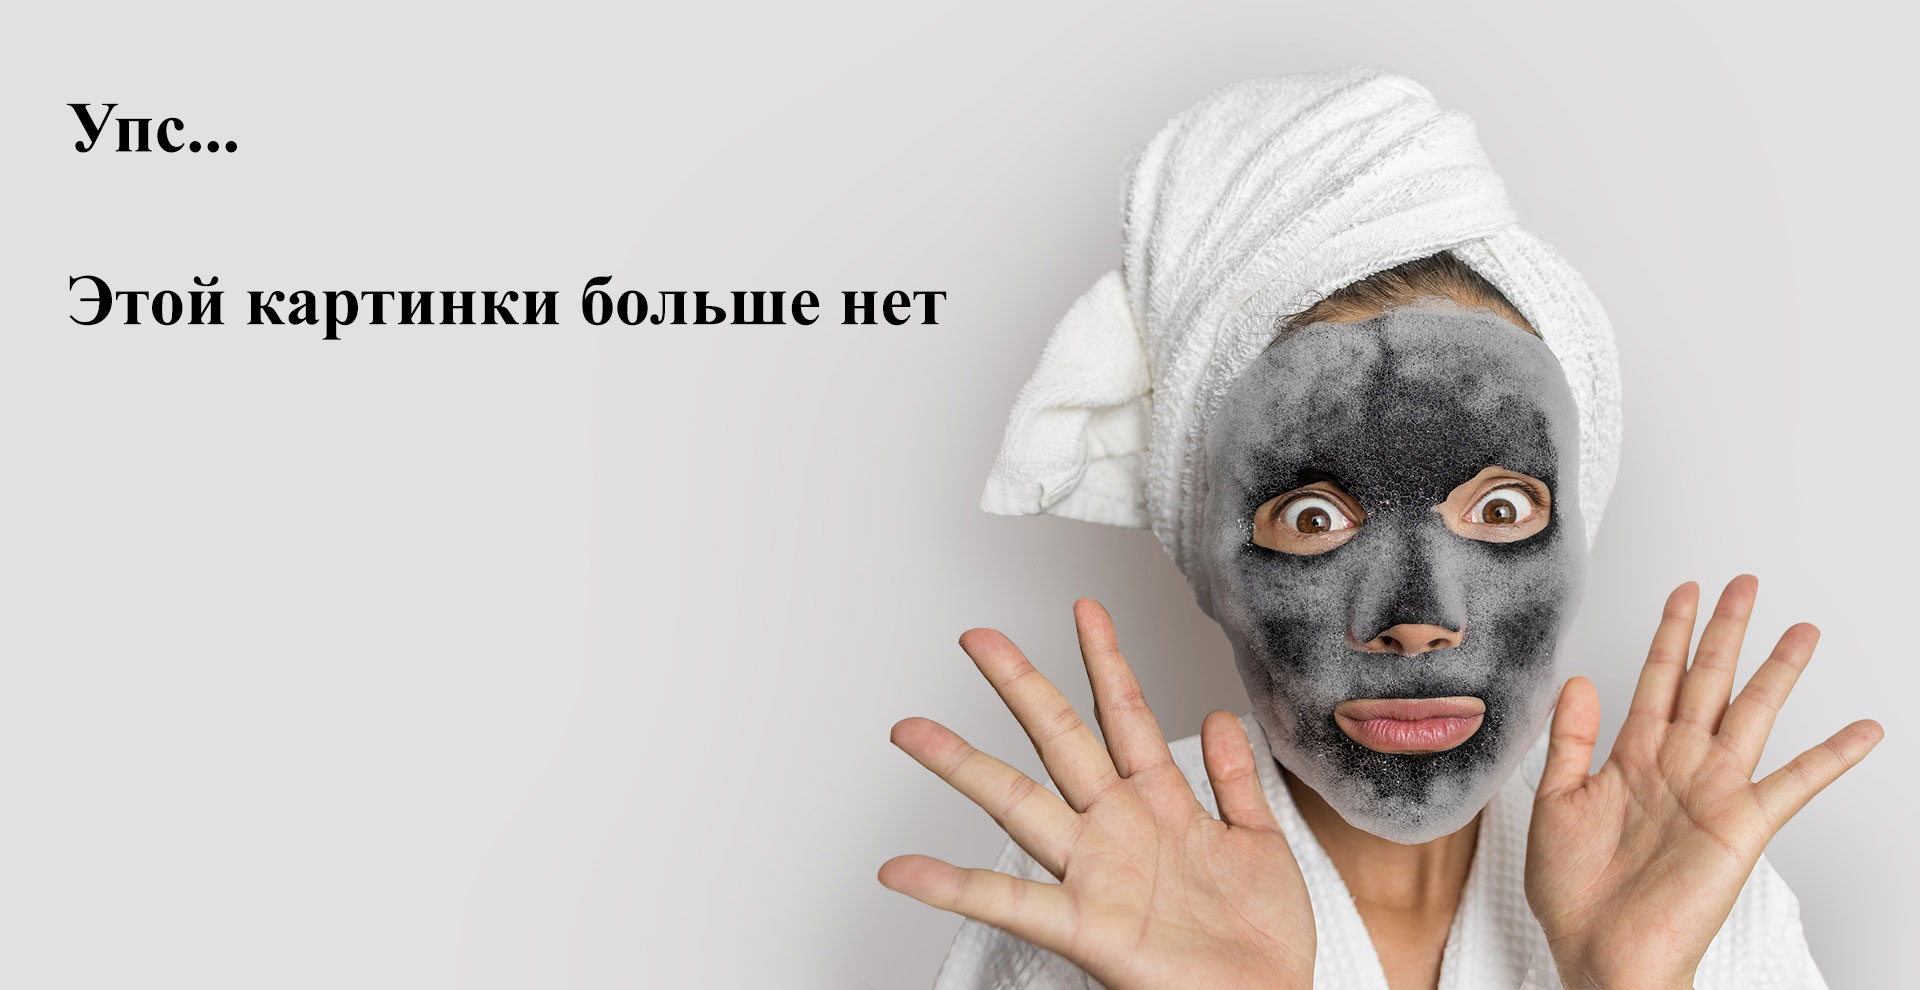 Patrisa Nail, Гель-лак Московская сага №760